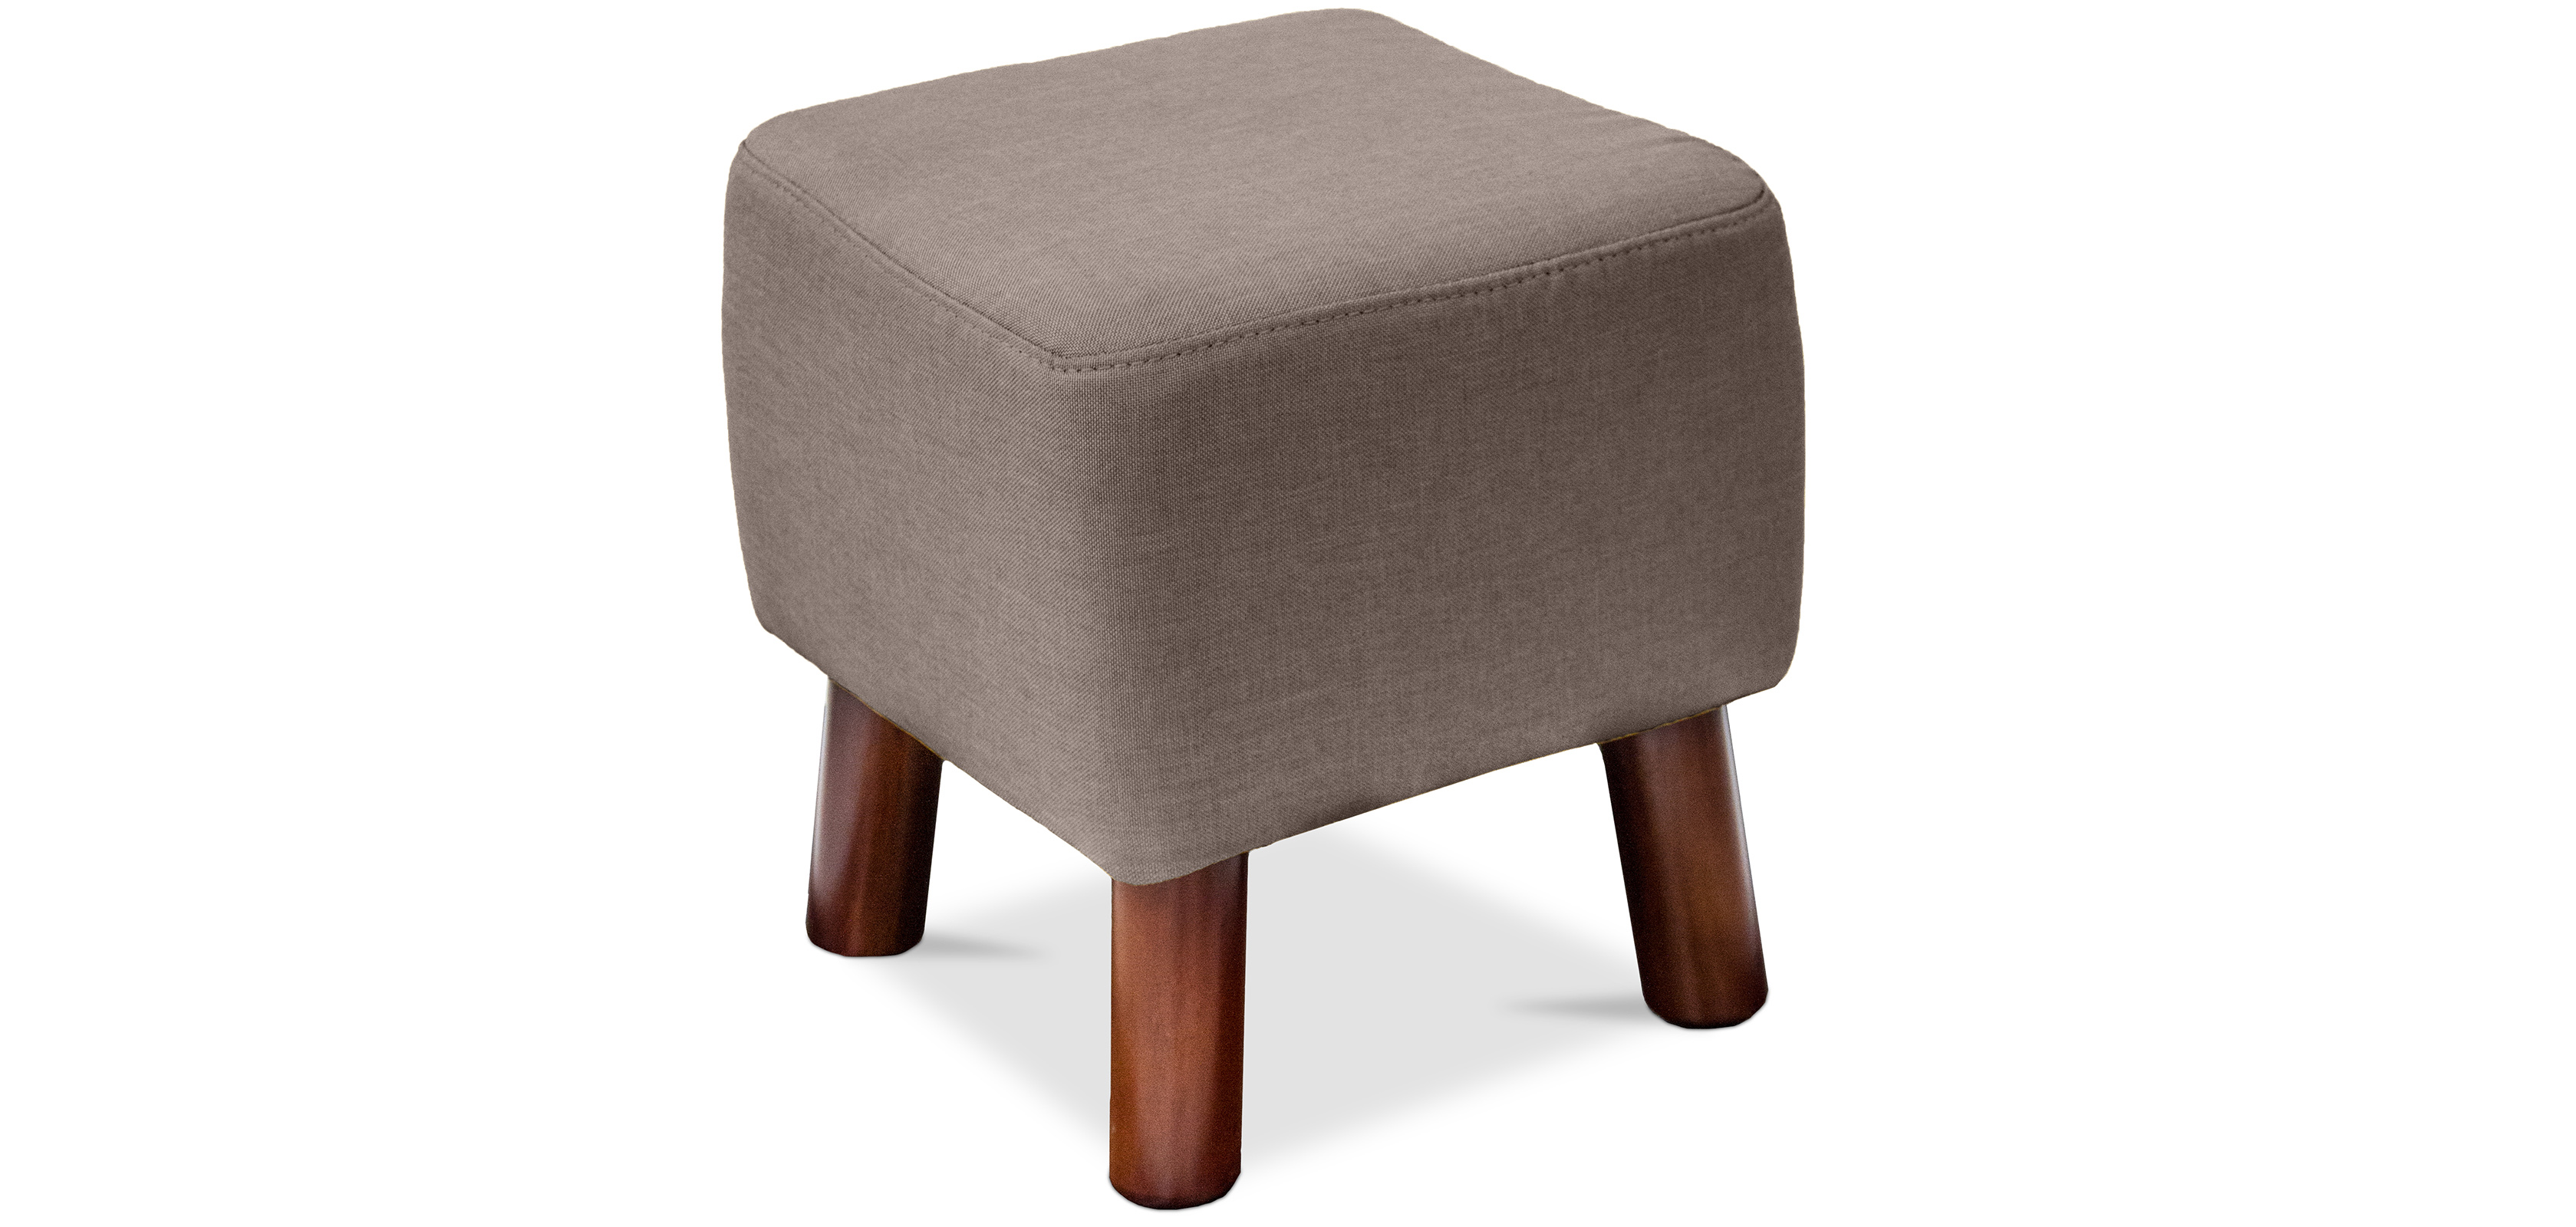 repose pied style scandinave. Black Bedroom Furniture Sets. Home Design Ideas